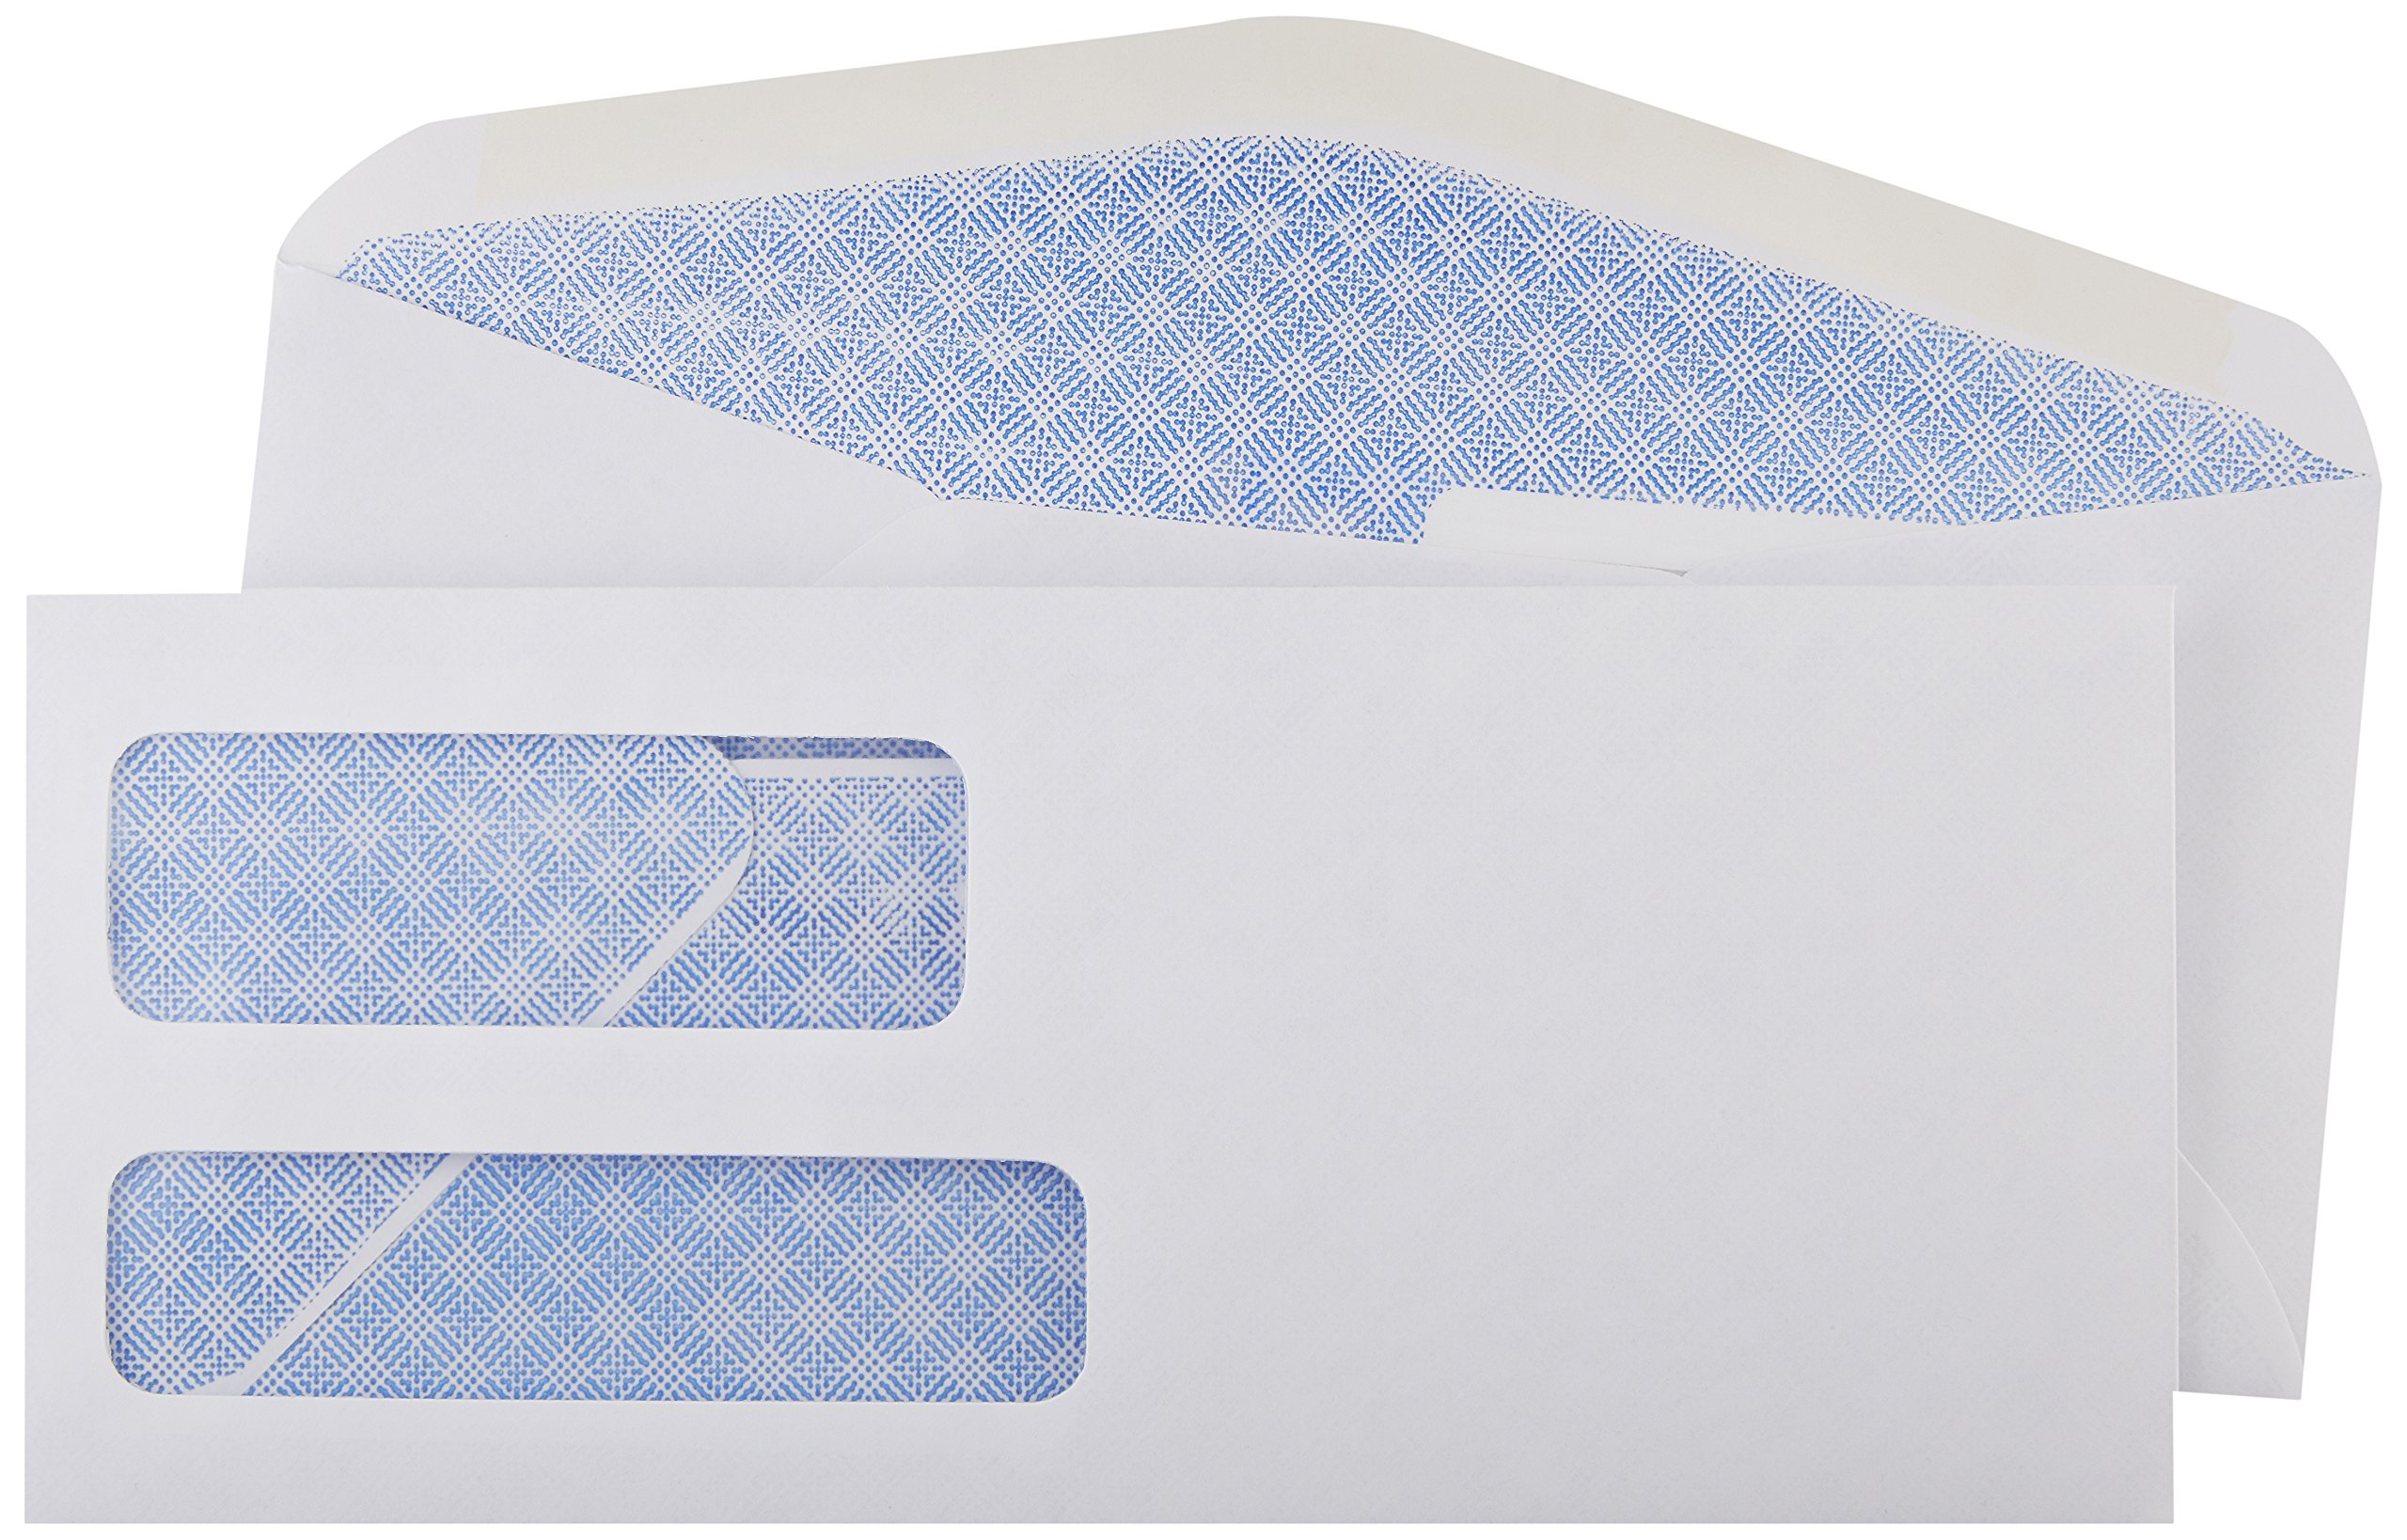 AmazonBasics AMZ92W #9 Double Window Envelopes, White, 500 ct